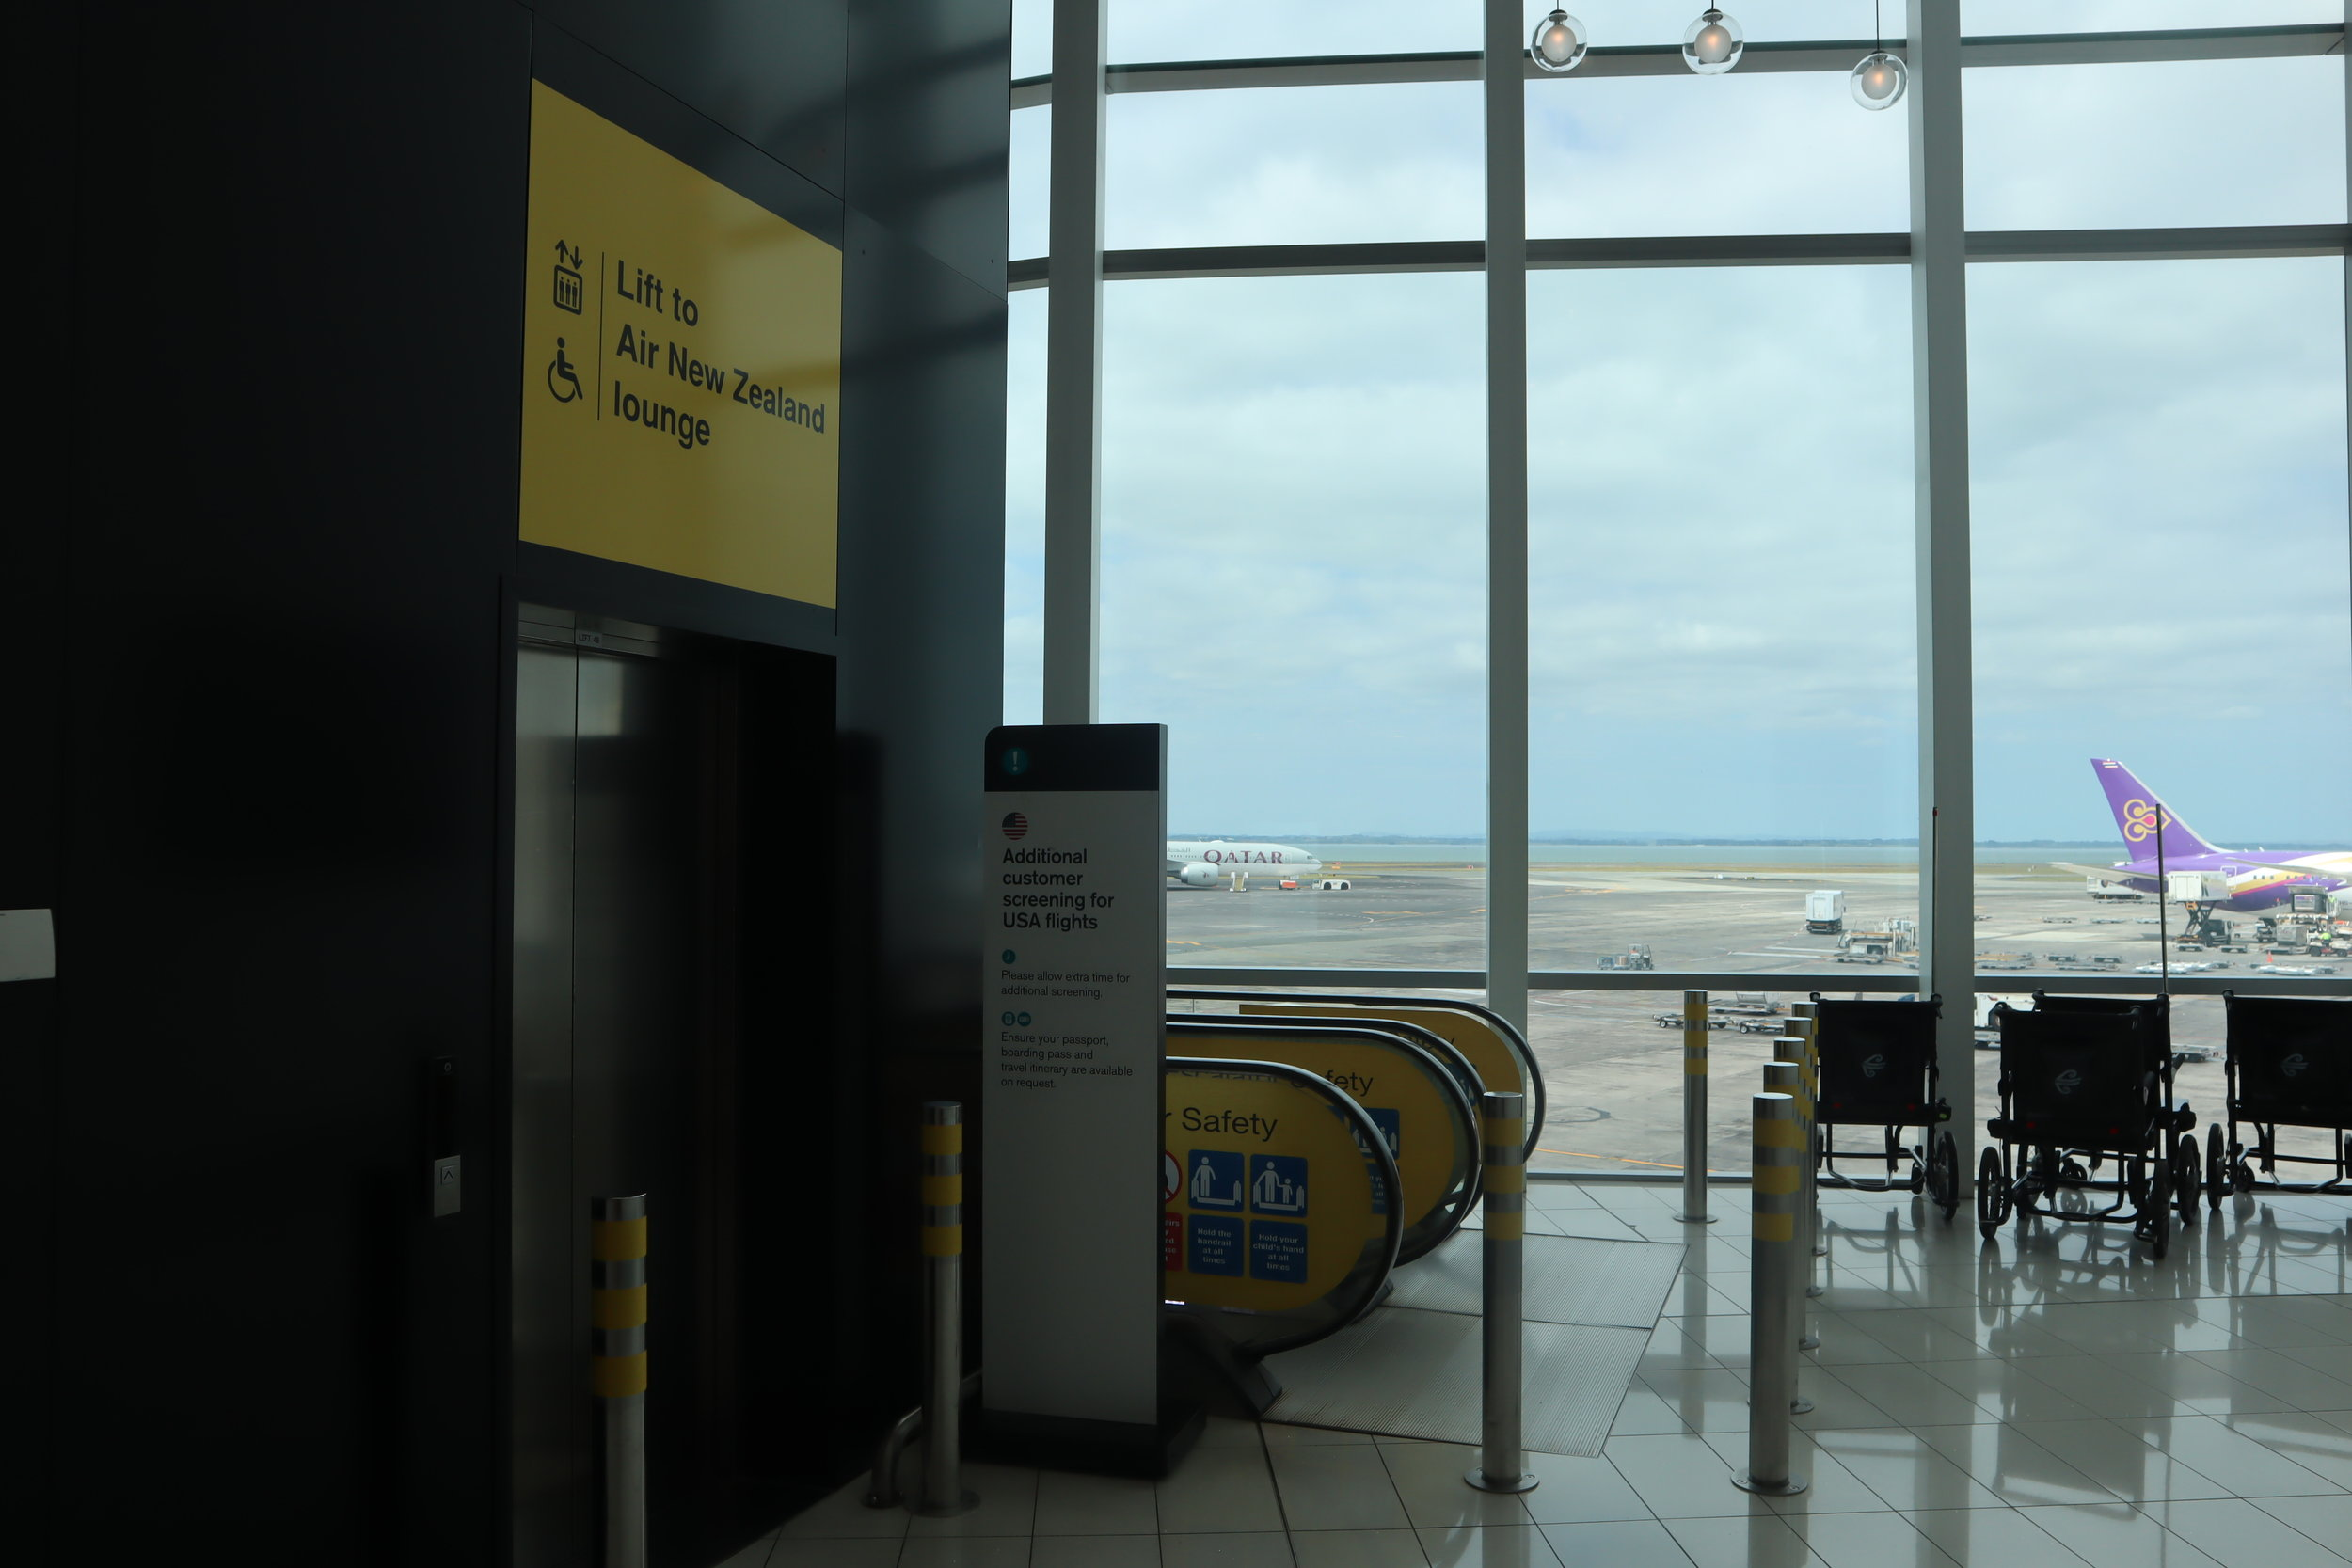 Air New Zealand Lounge Auckland – Escalators